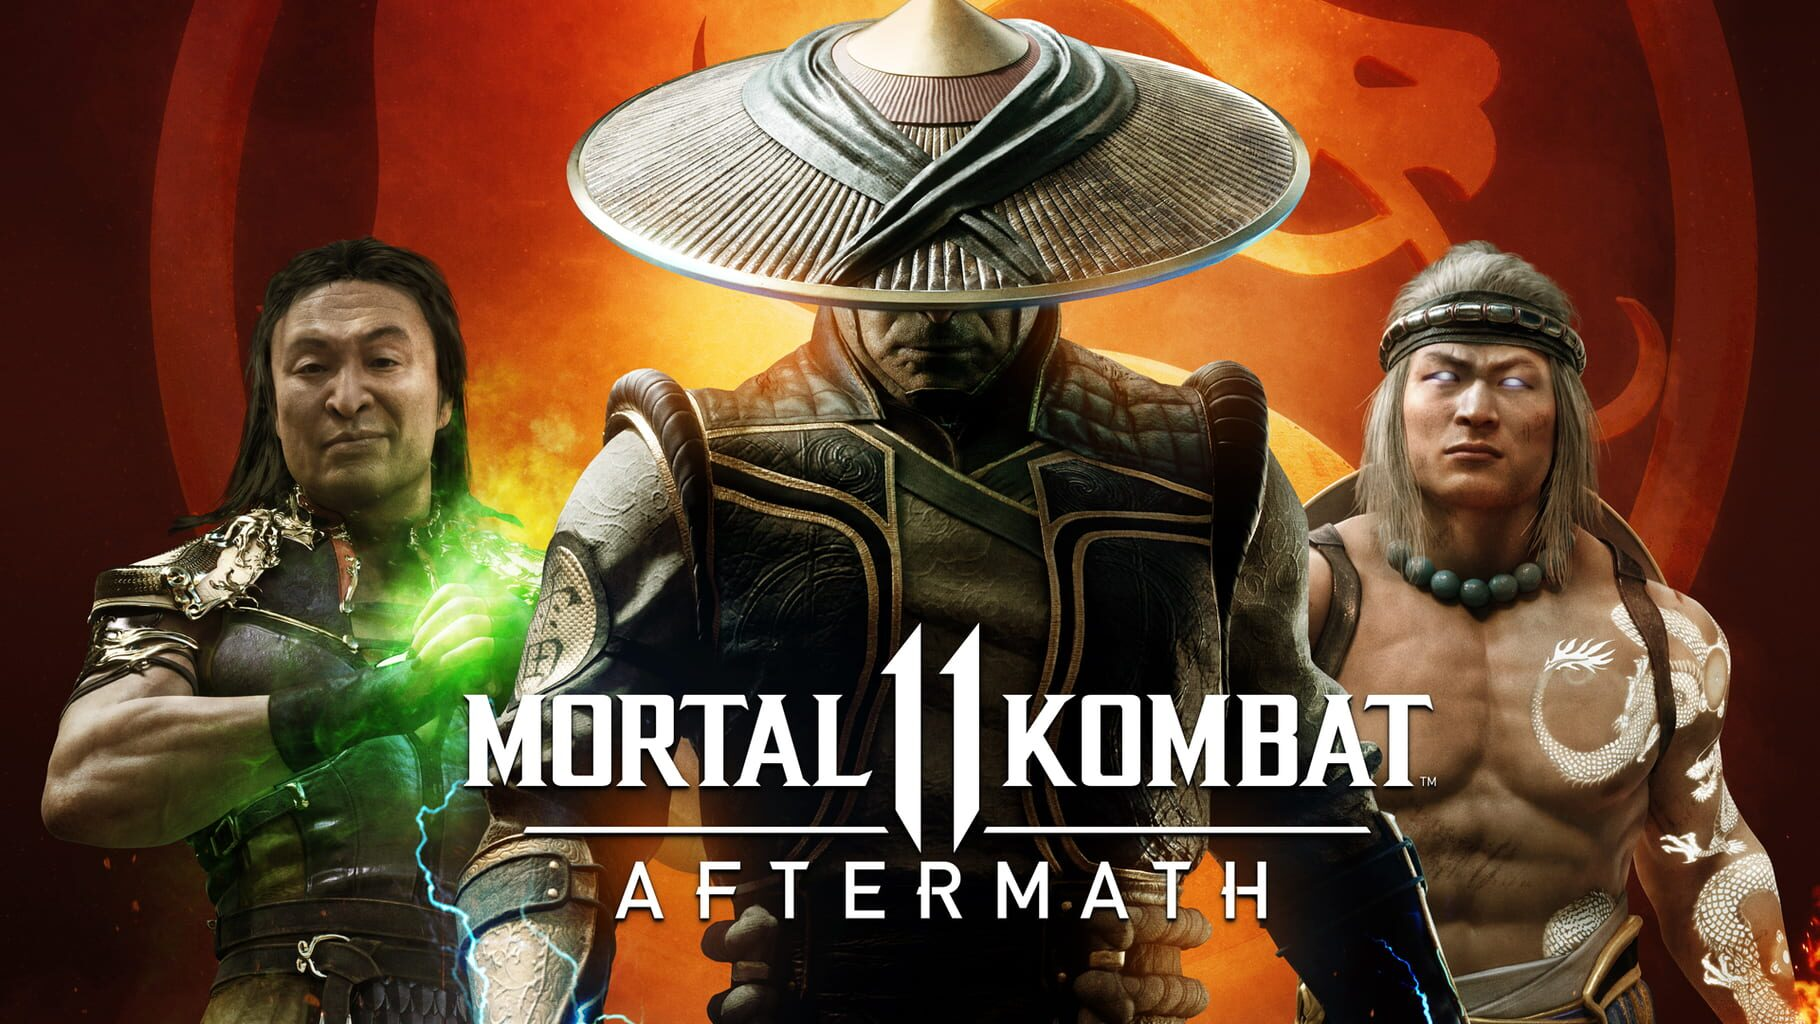 Gameplay Screenshot from Mortal Kombat 11: Aftermath